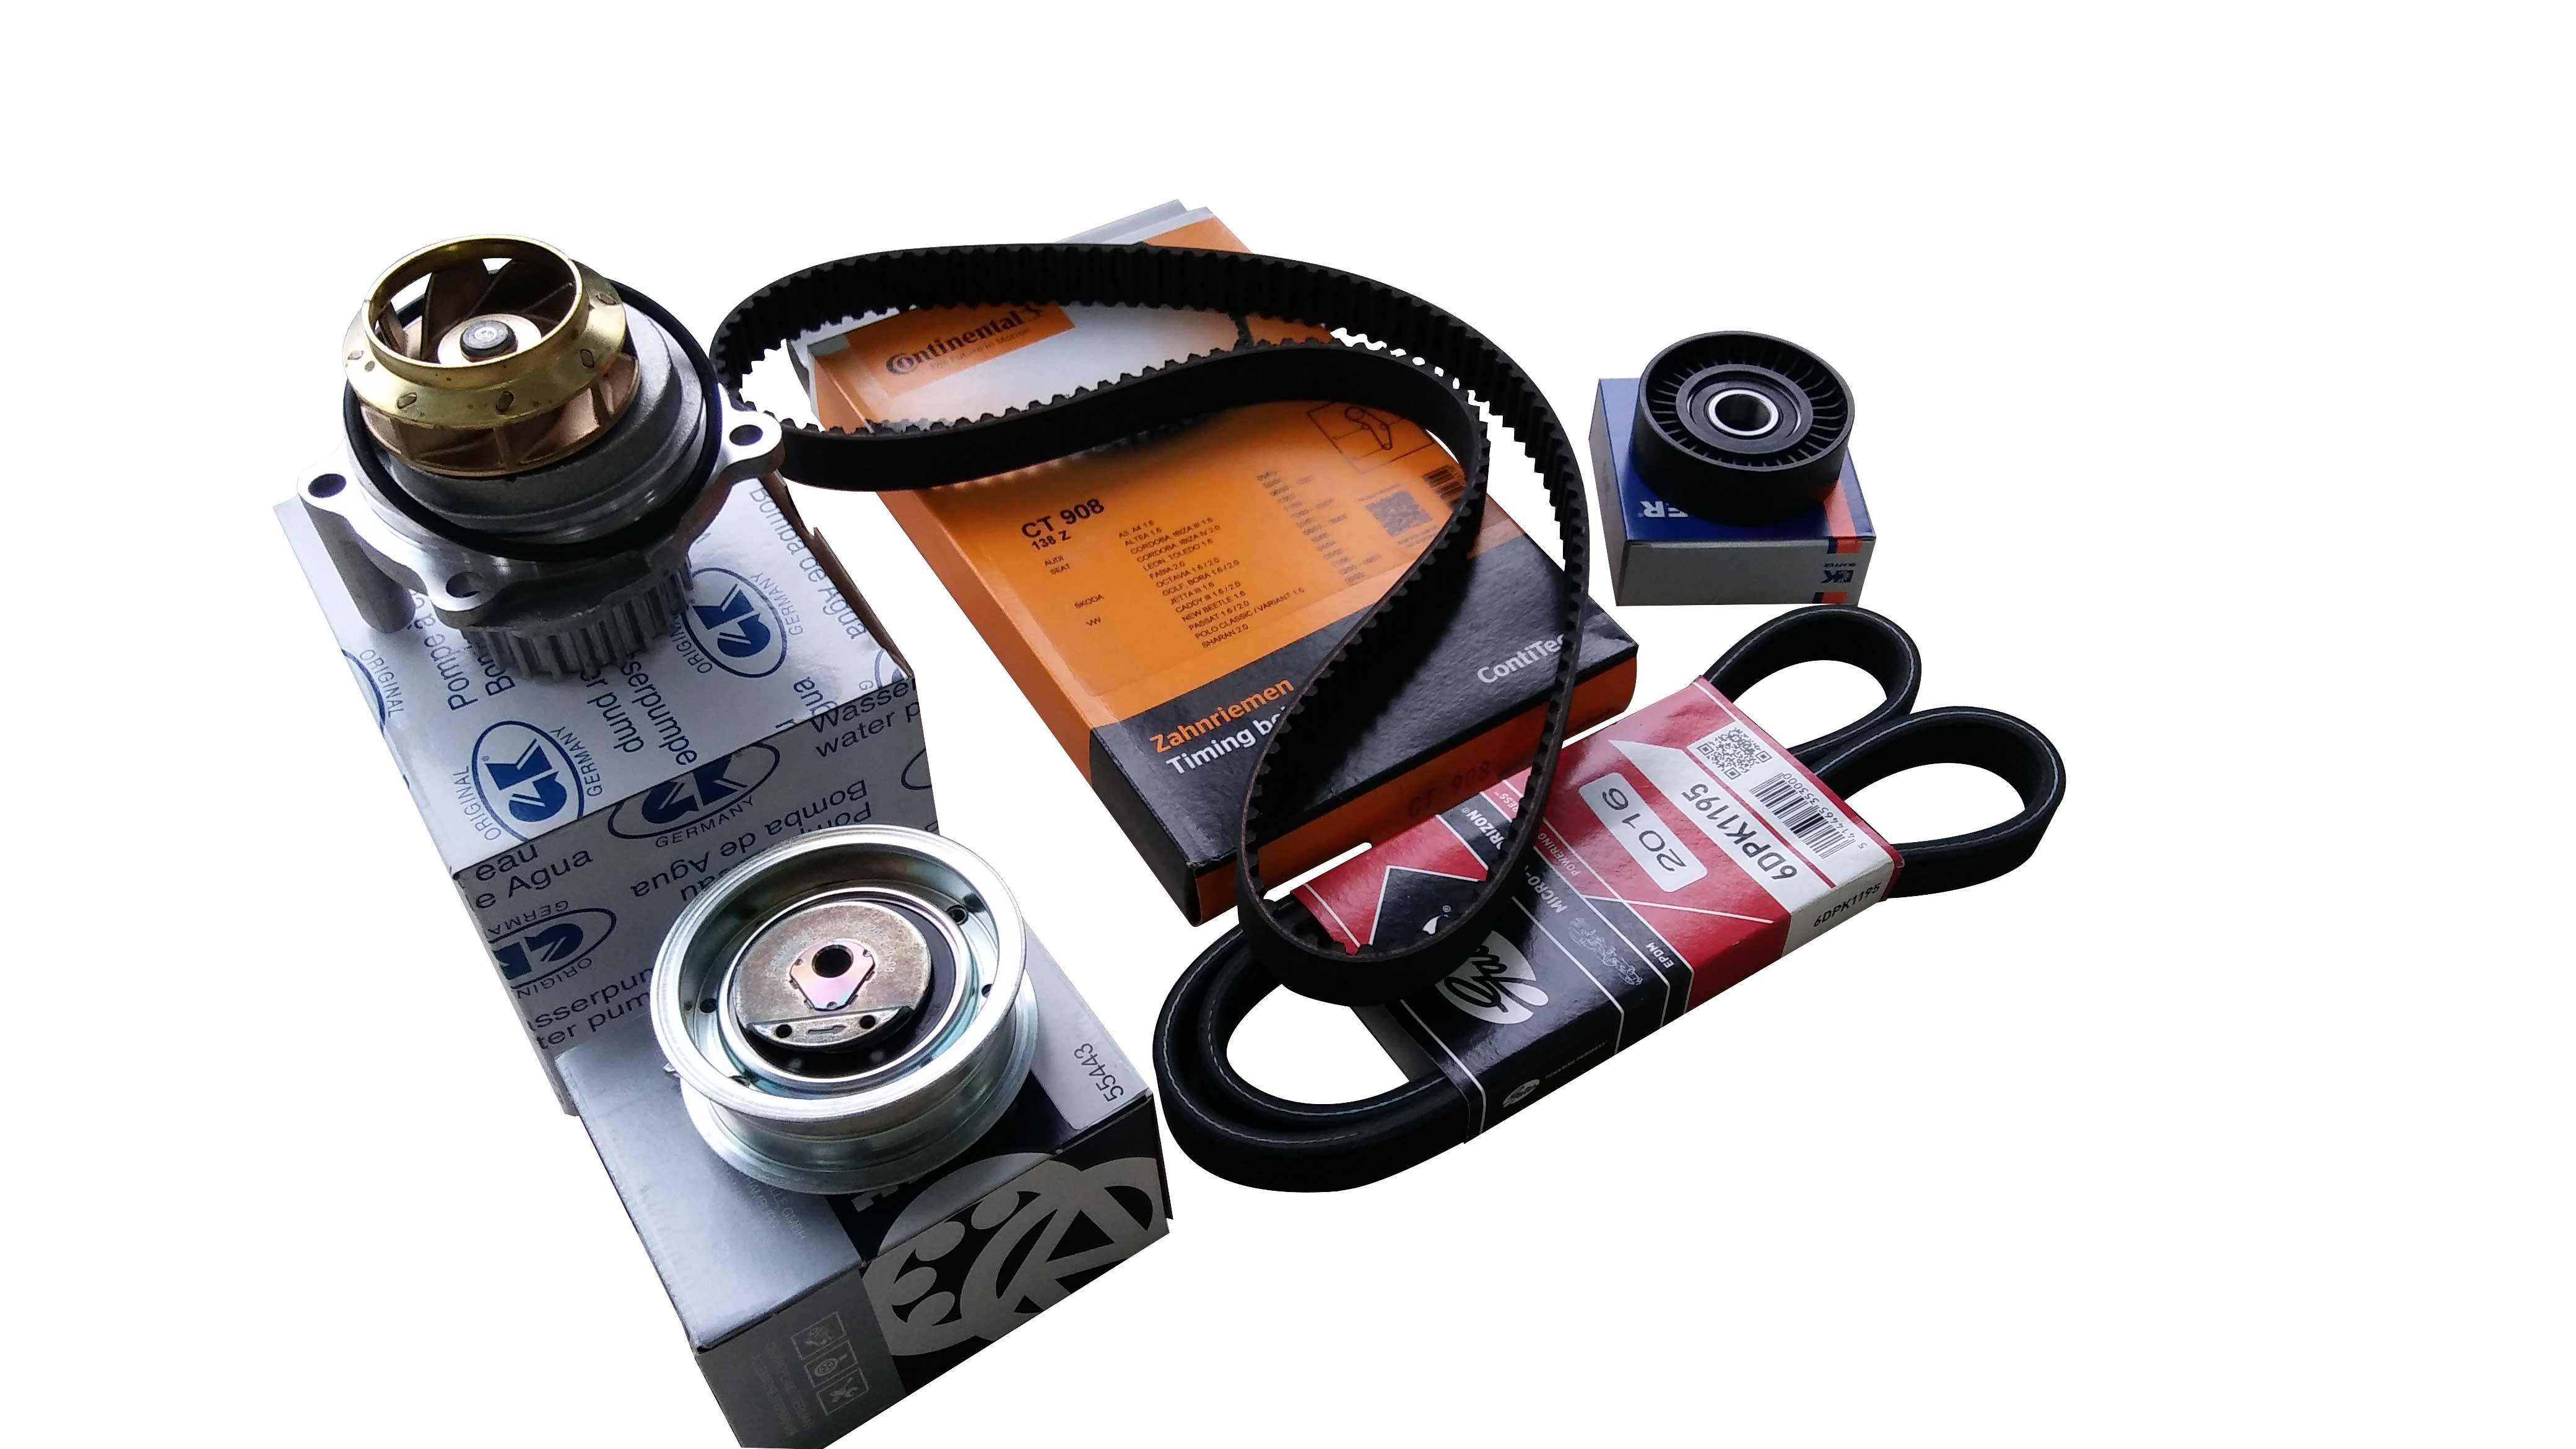 Triger Seti Full Set - Golf 4 - Bora AKL BFQ Motor